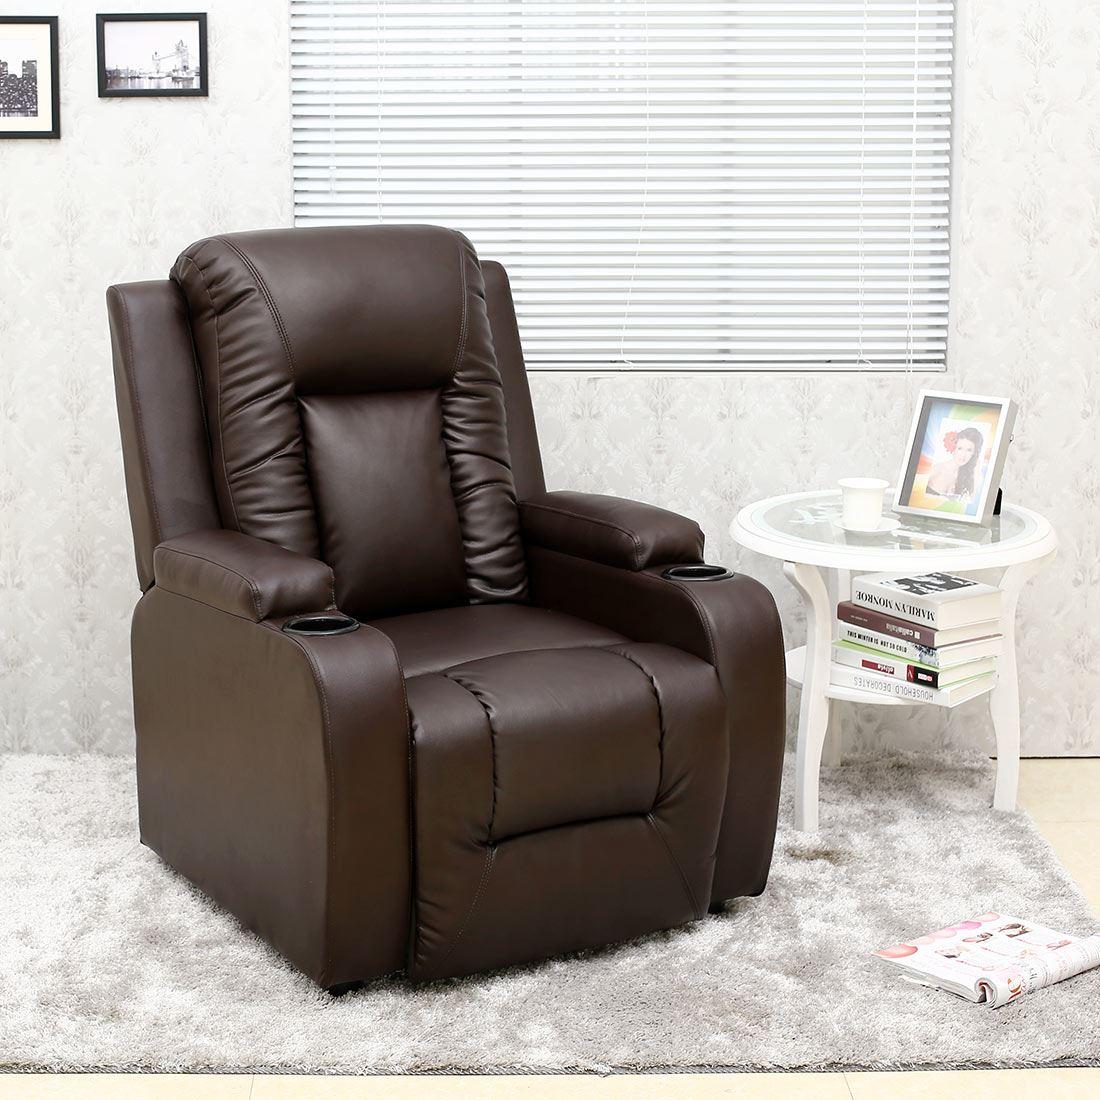 sofa armchair drink holder caddy secional sofas oscar leather recliner w holders chair